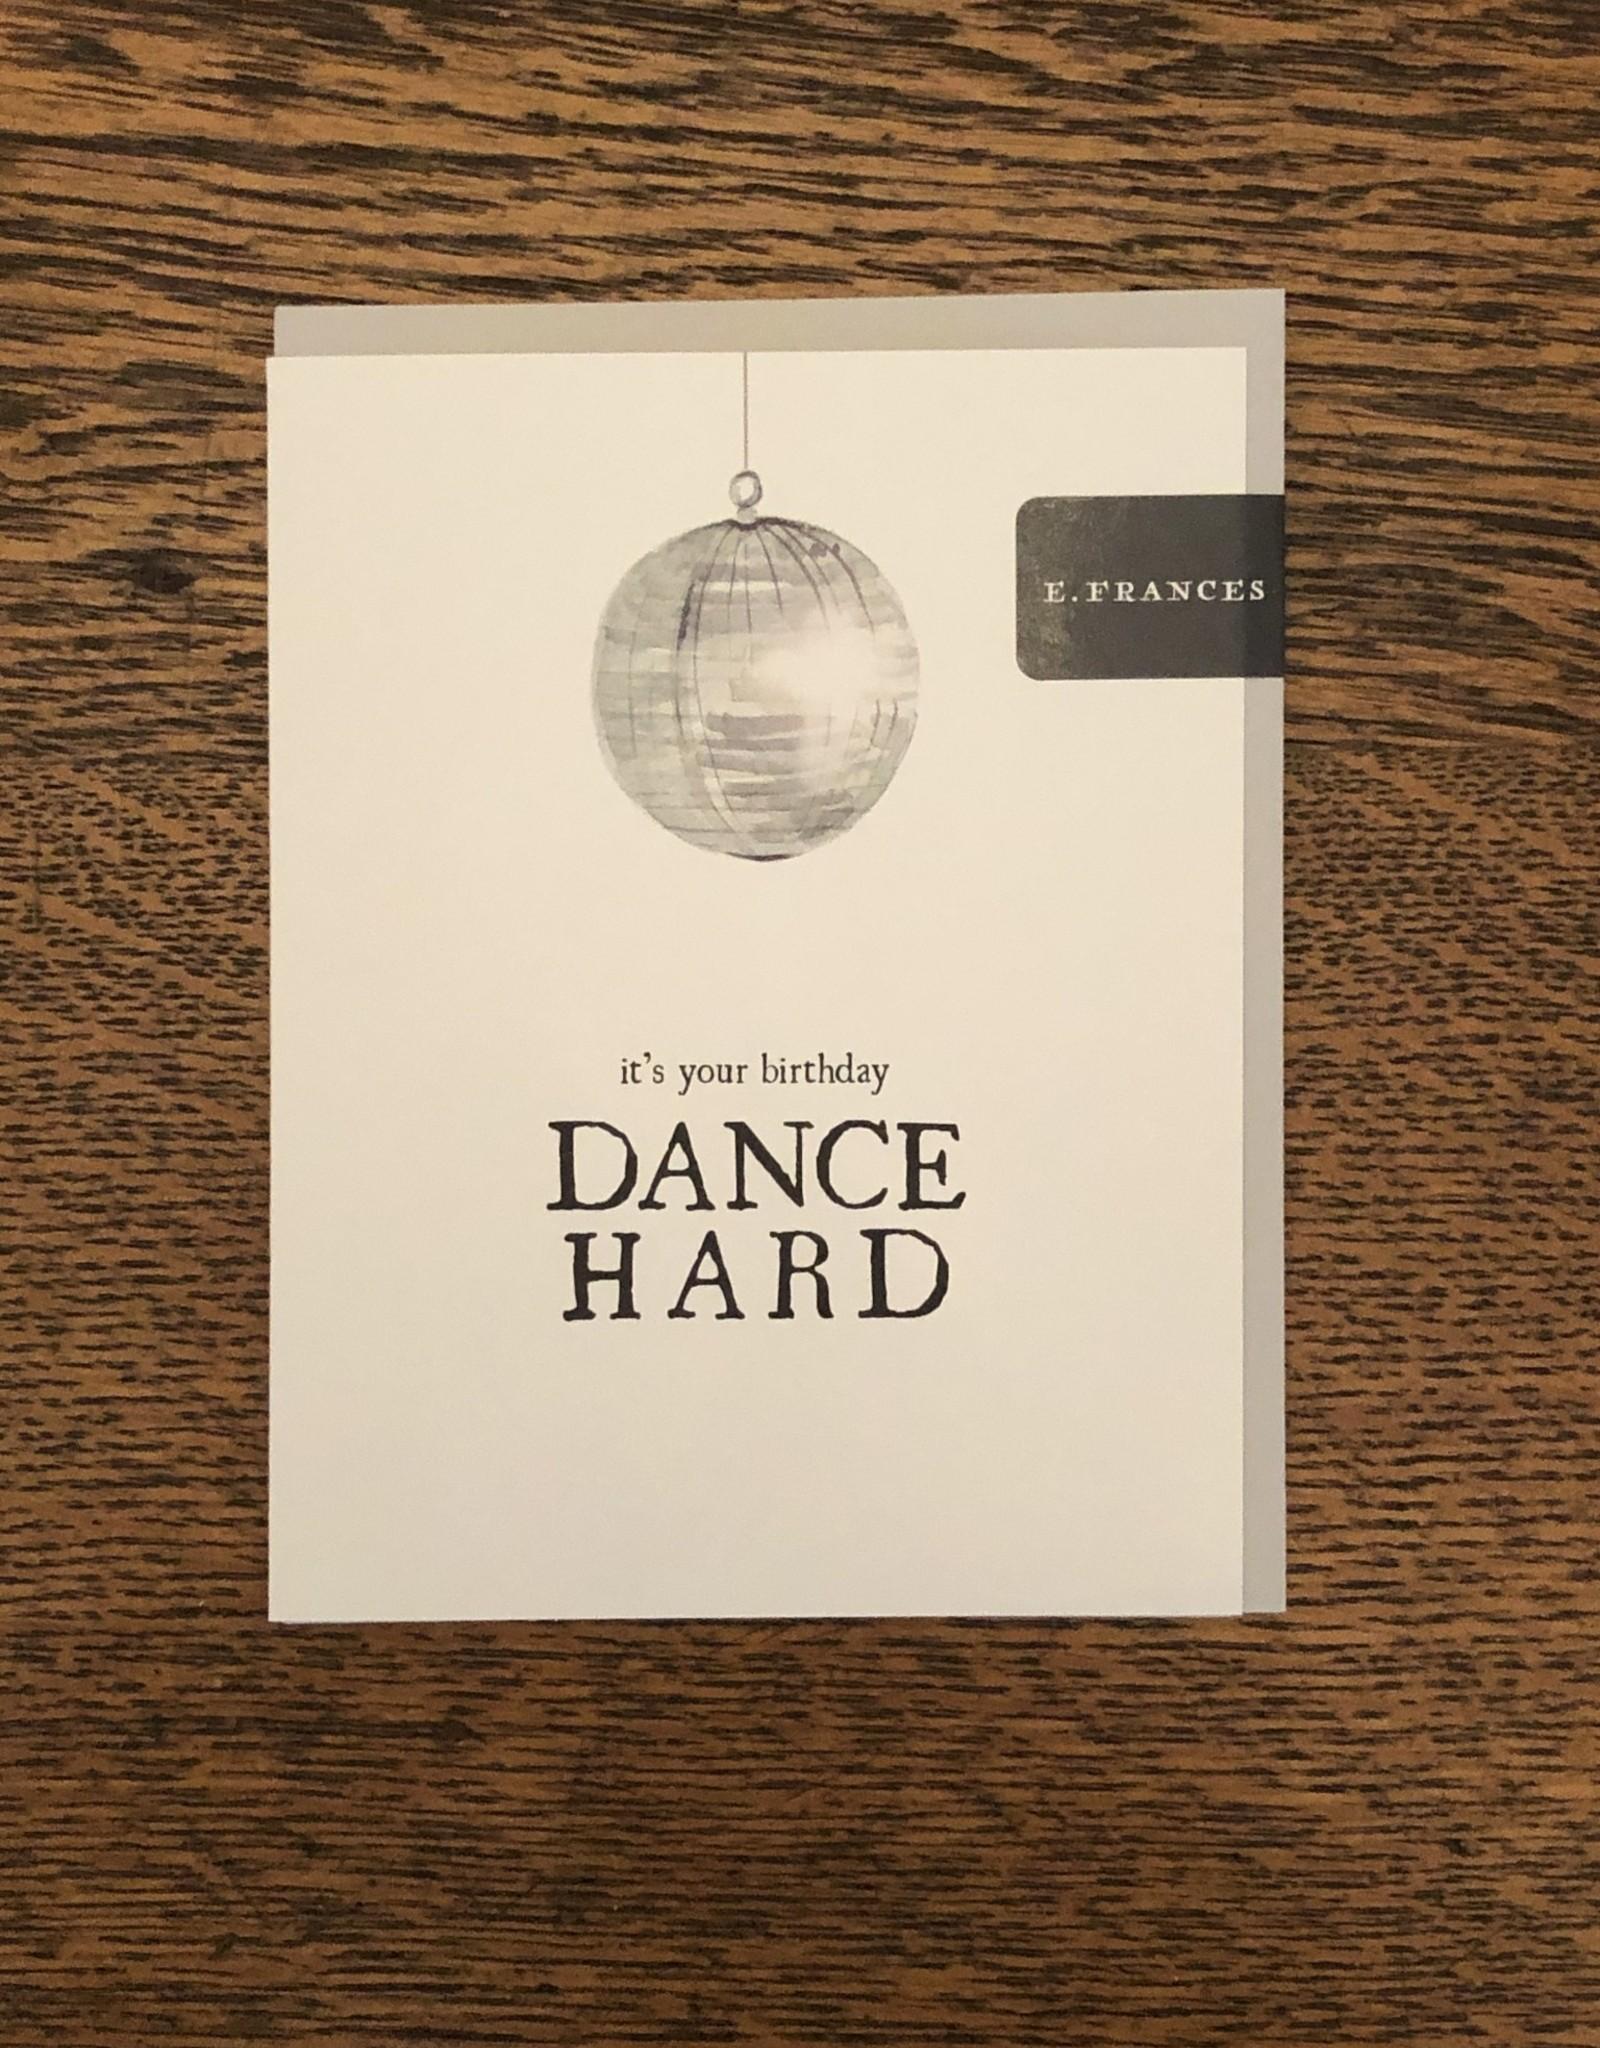 E Frances Paper Disco Ball Card